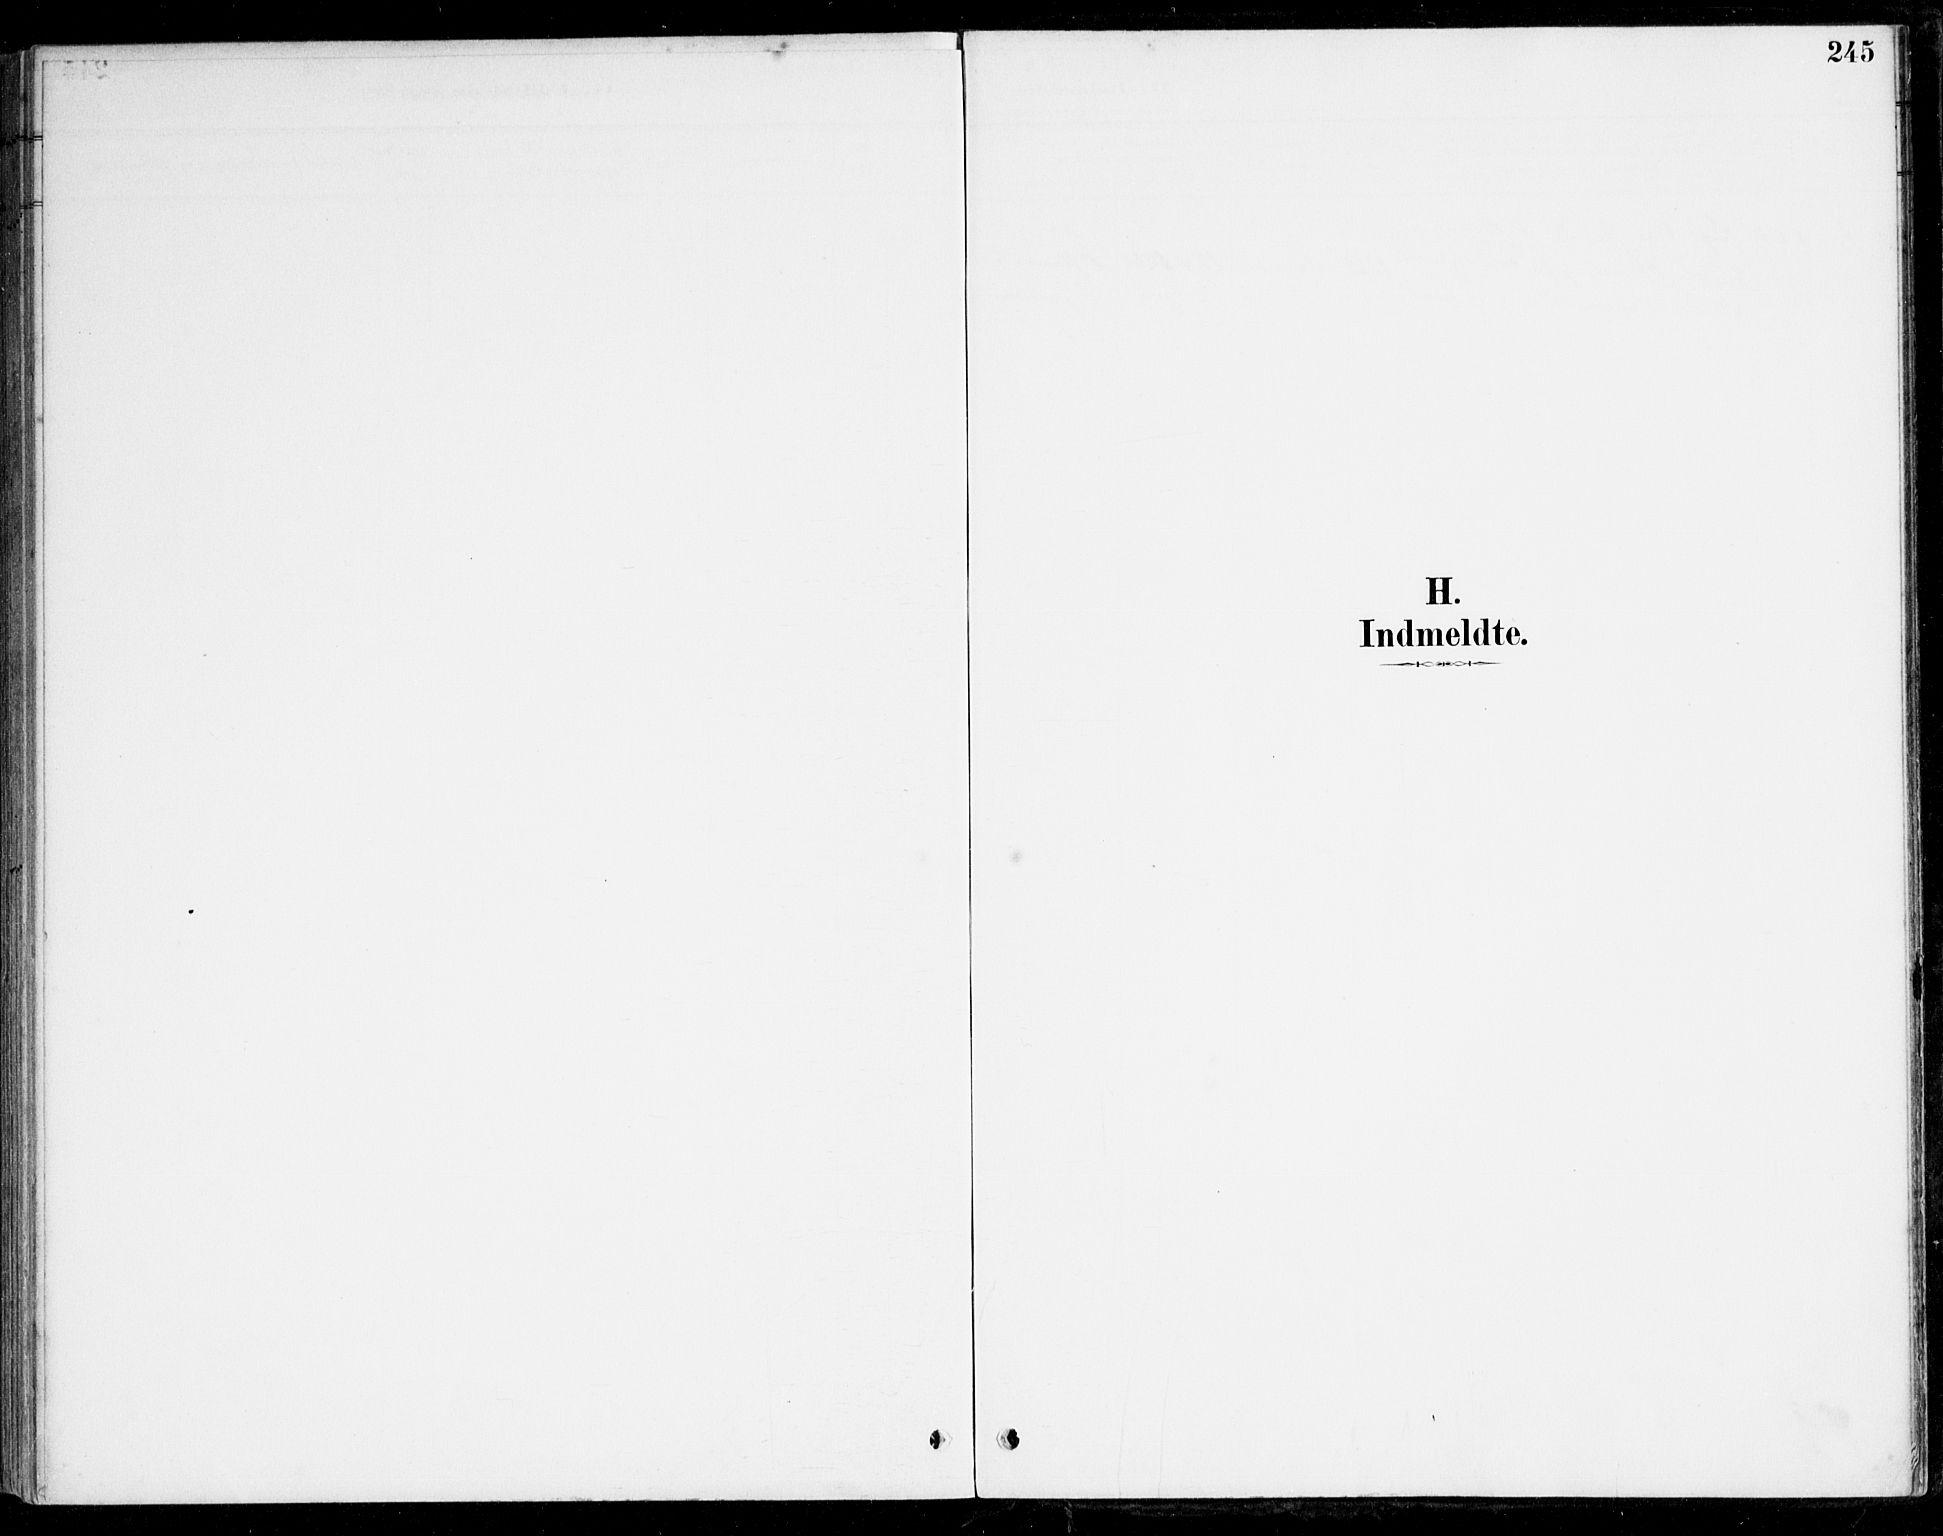 SAK, Herad sokneprestkontor, F/Fa/Fab/L0005: Ministerialbok nr. A 5, 1886-1913, s. 245